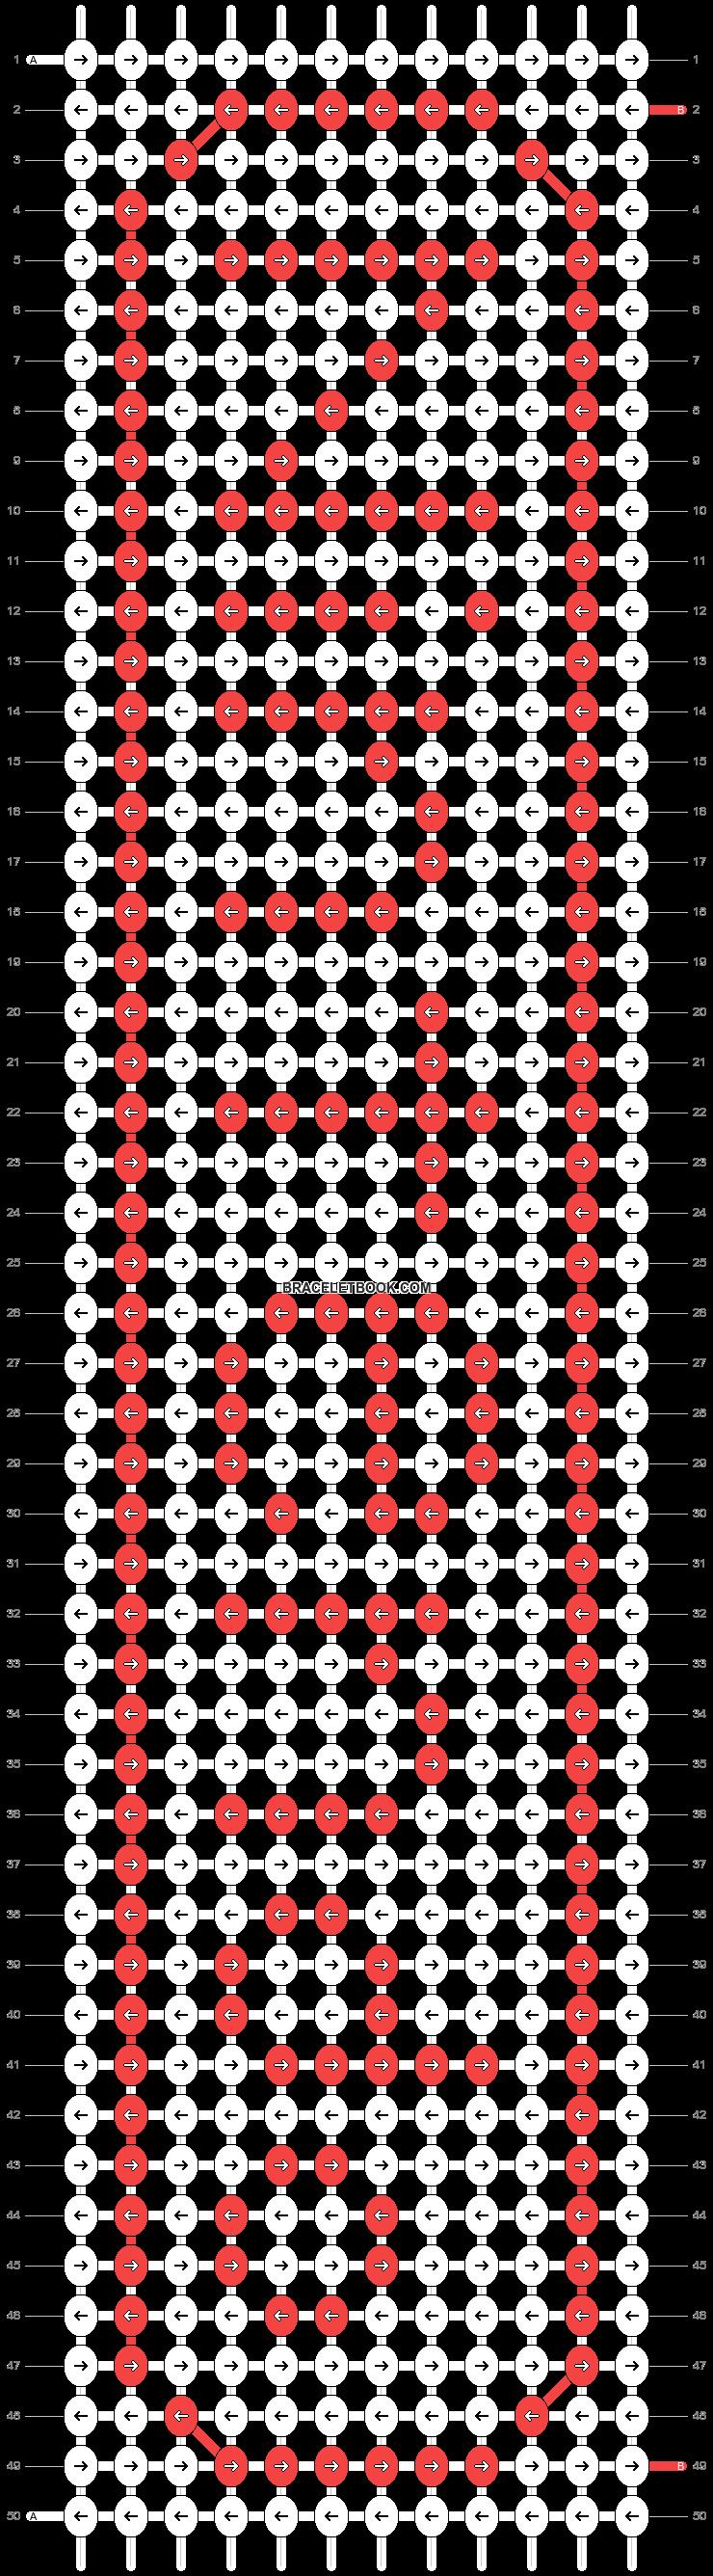 Alpha pattern #198 pattern